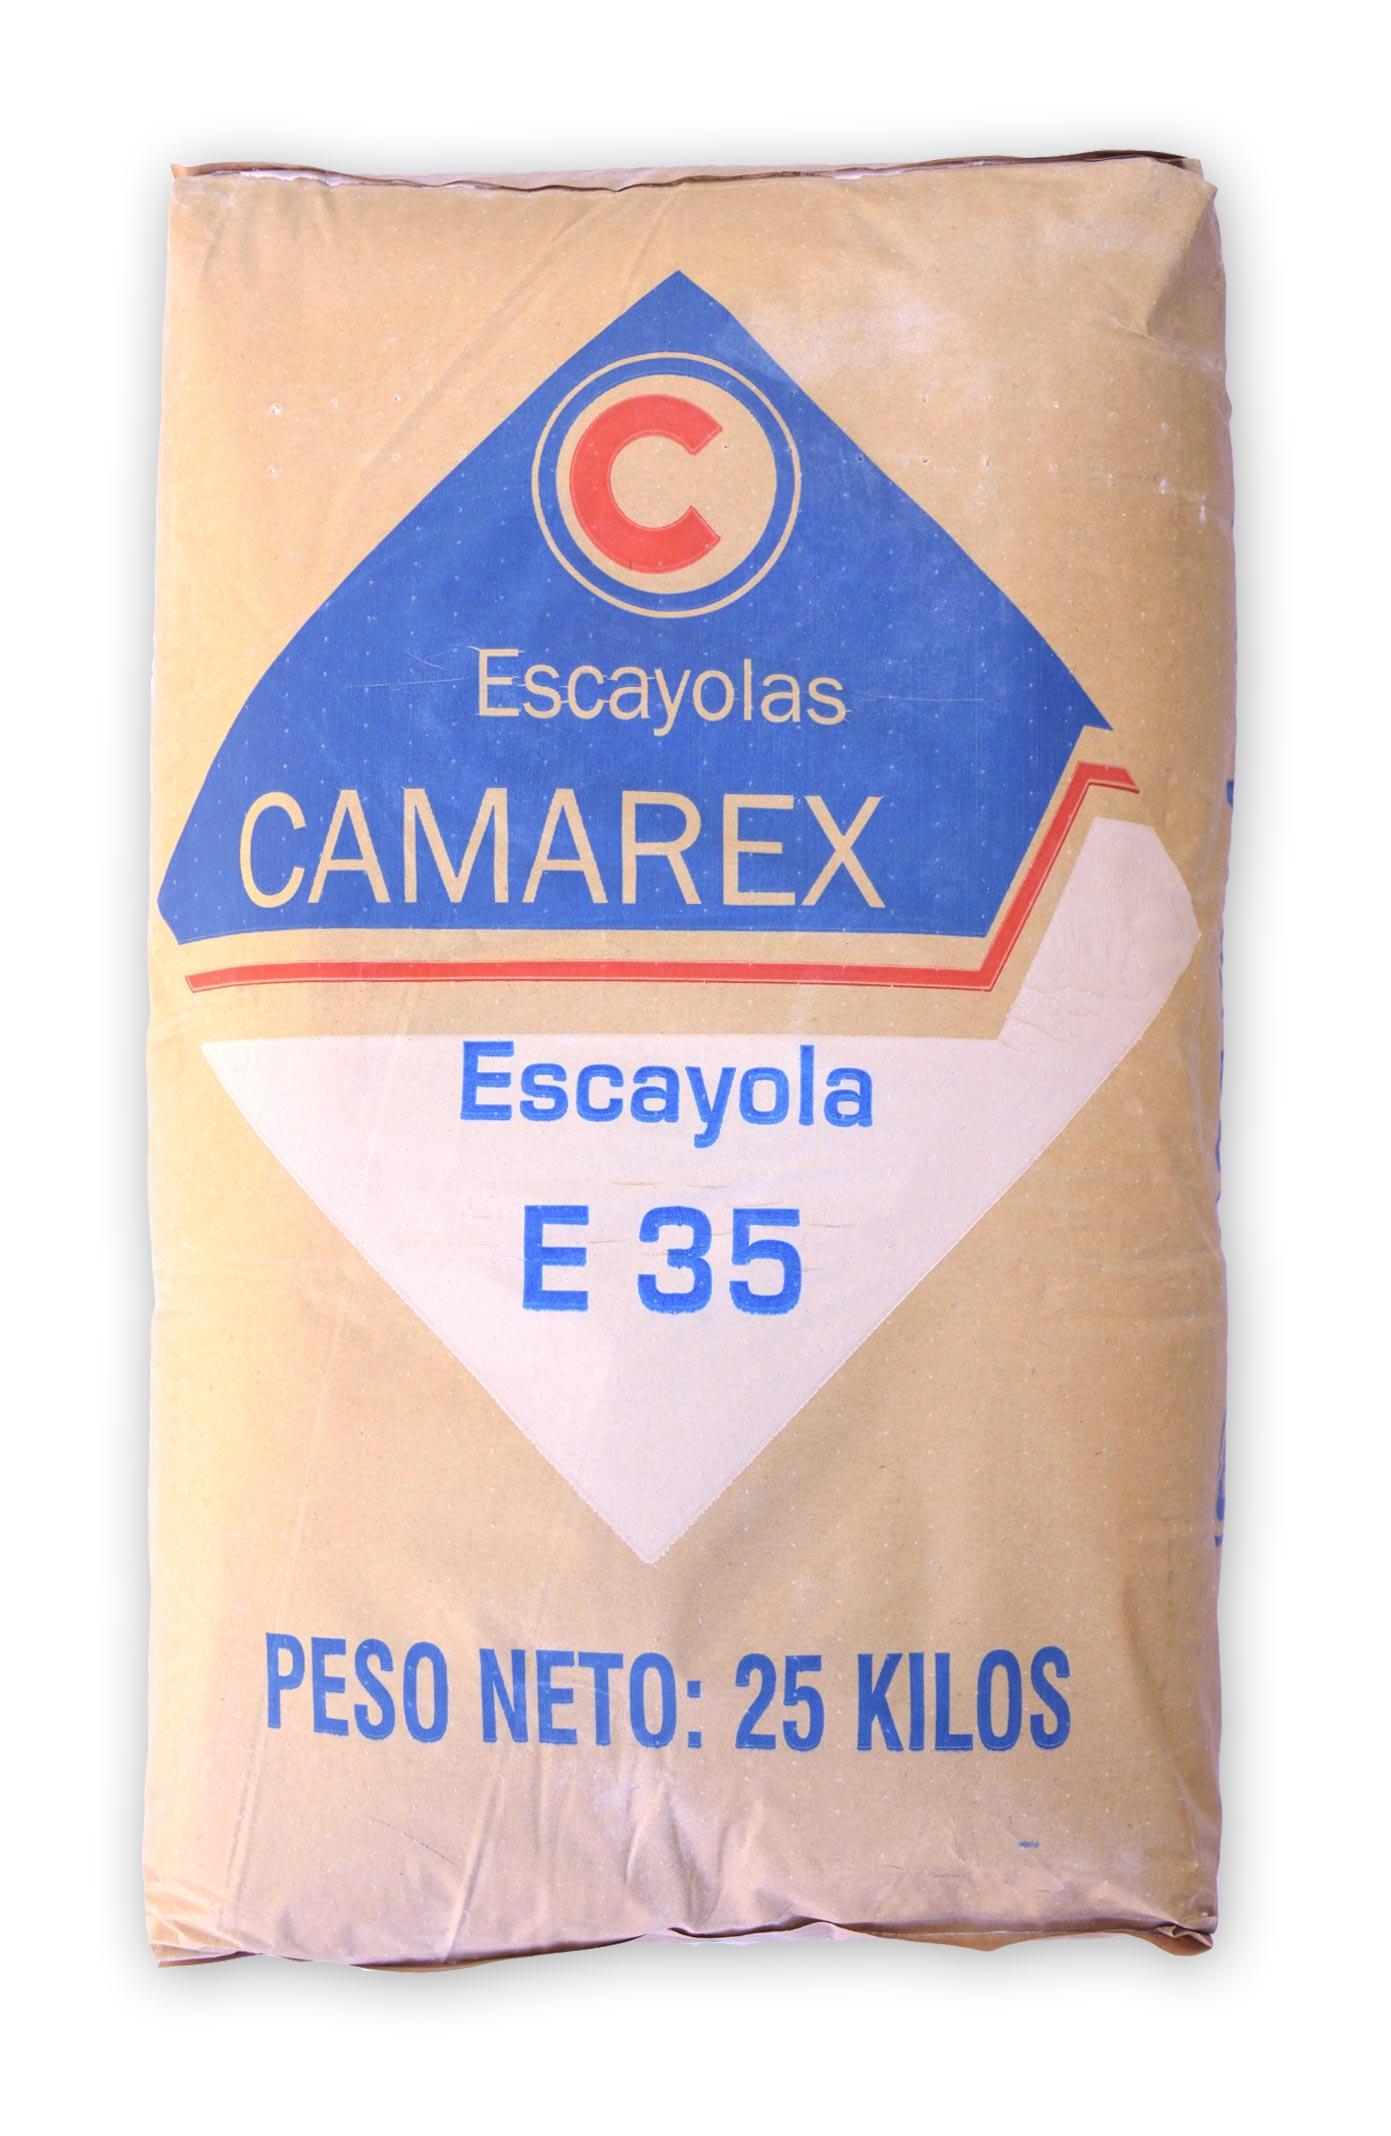 Escayola Camarex